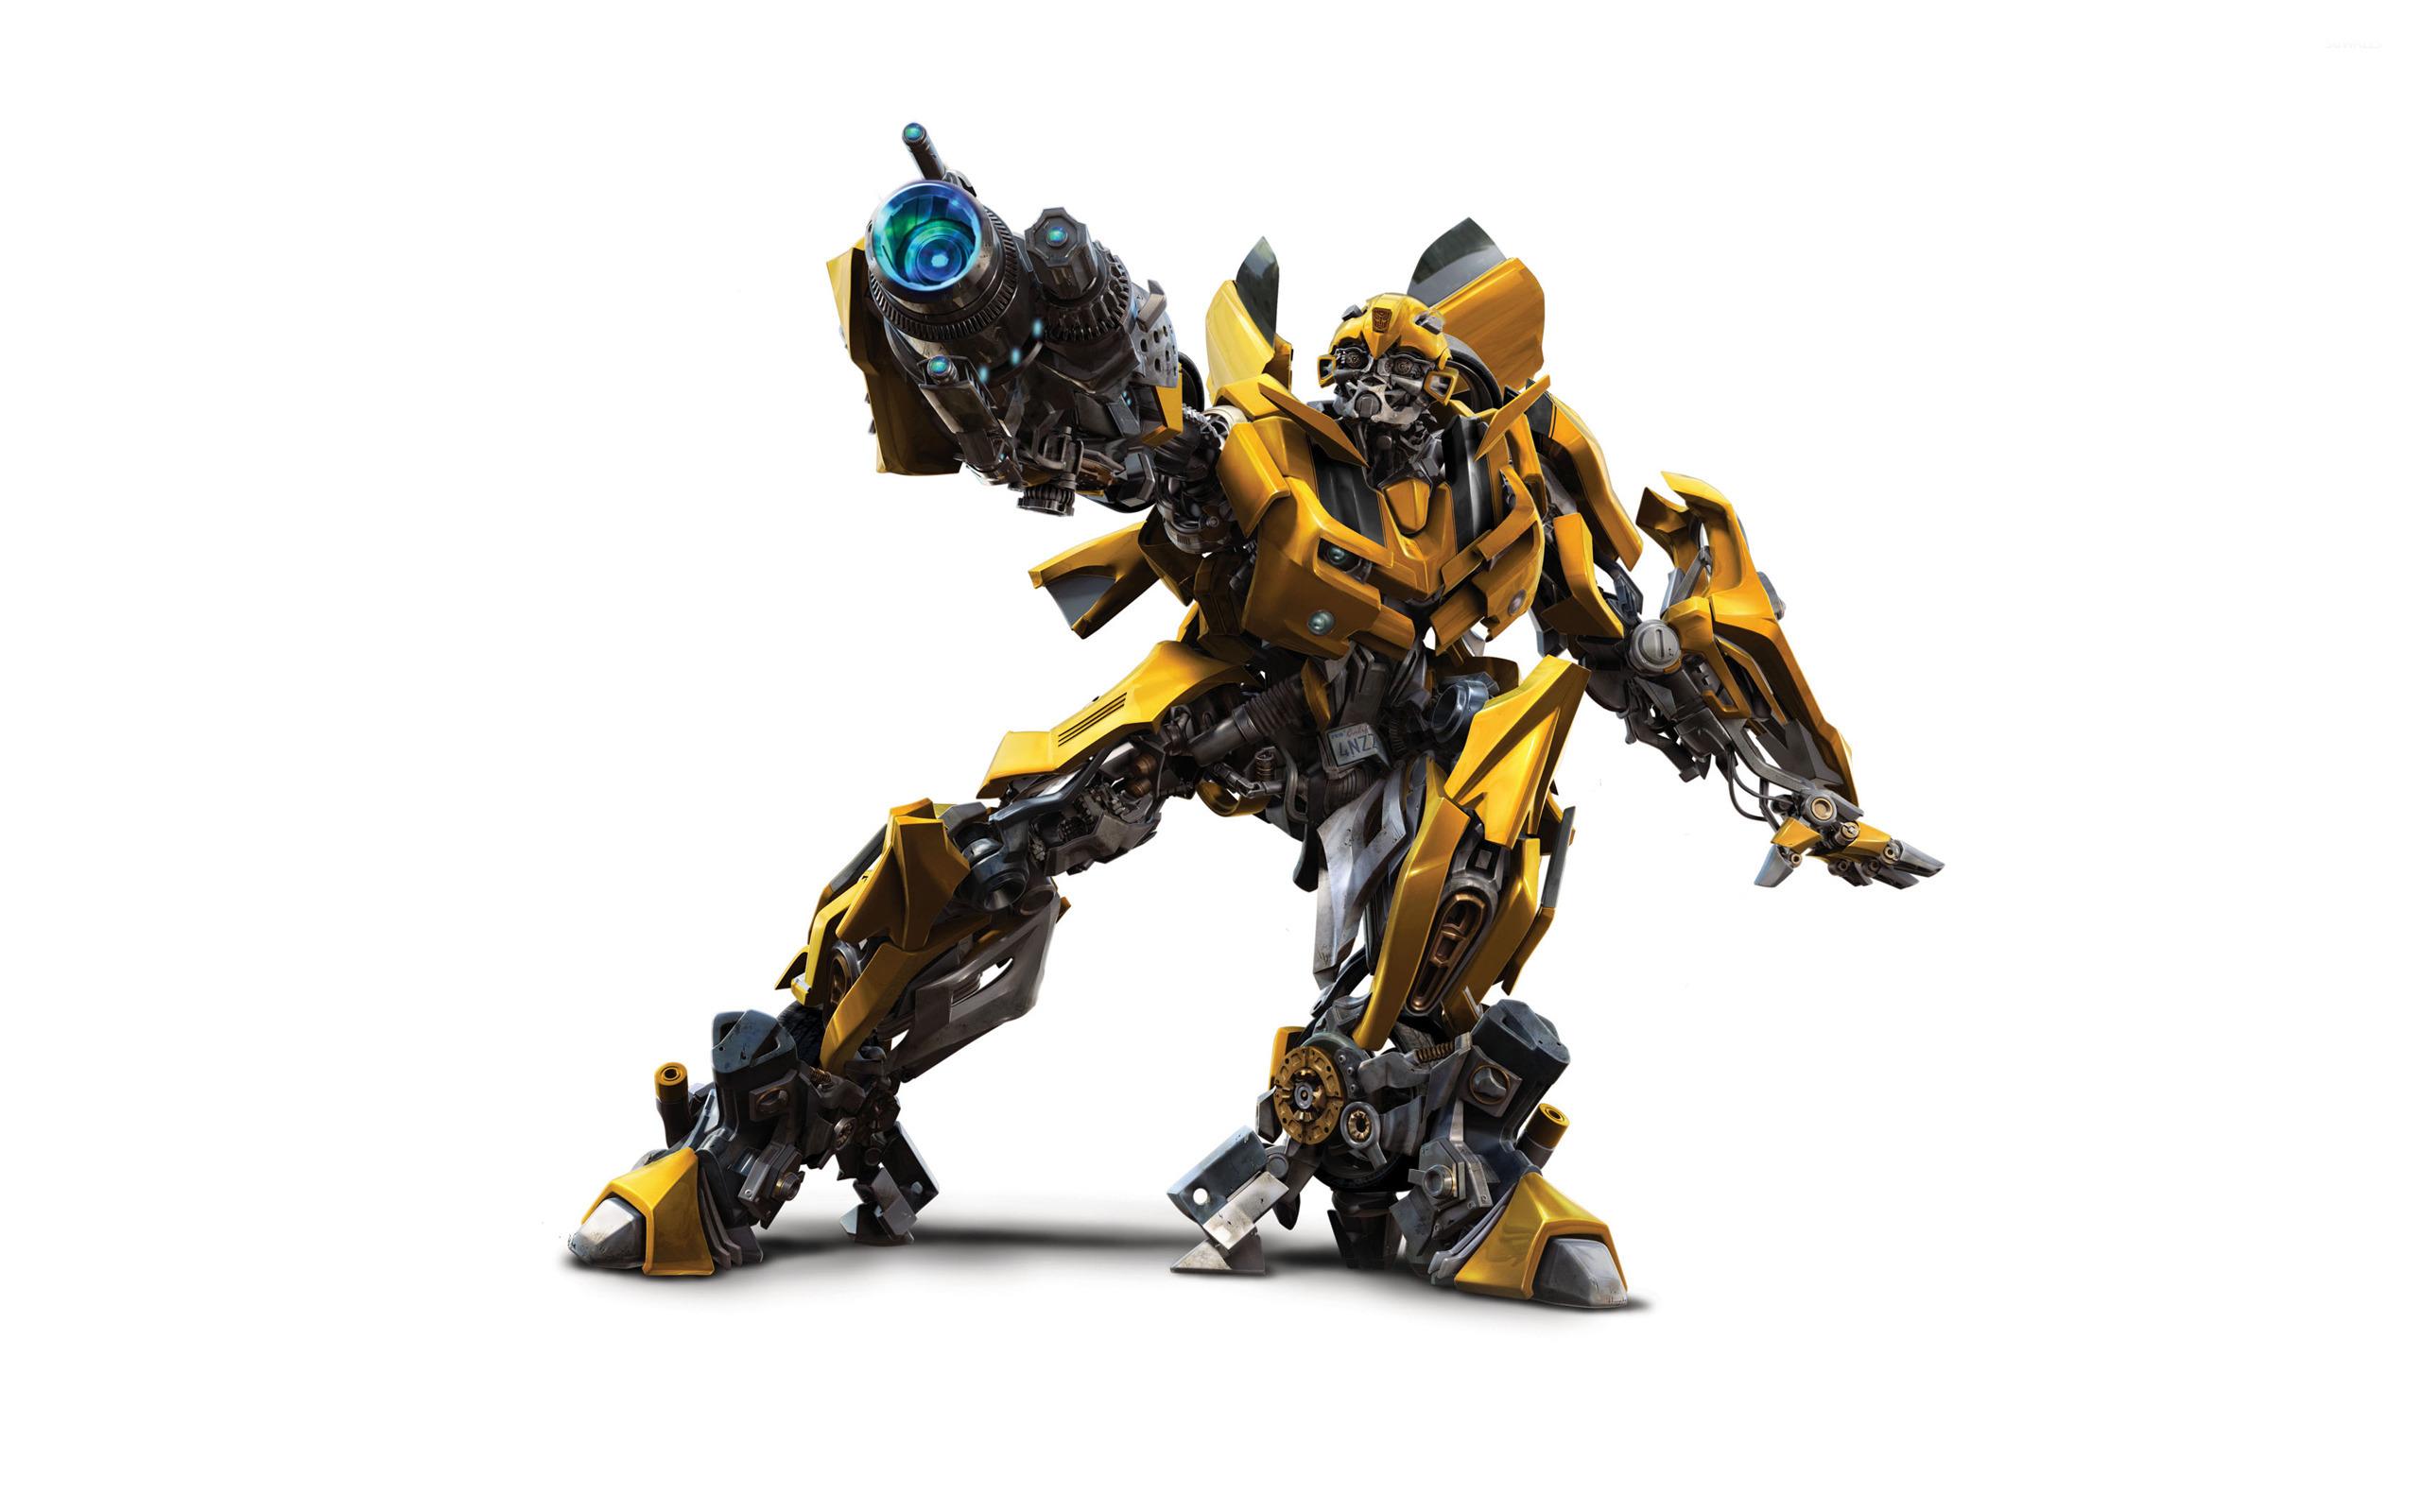 Transformers Jazz Wallpaper Sf Wallpaper